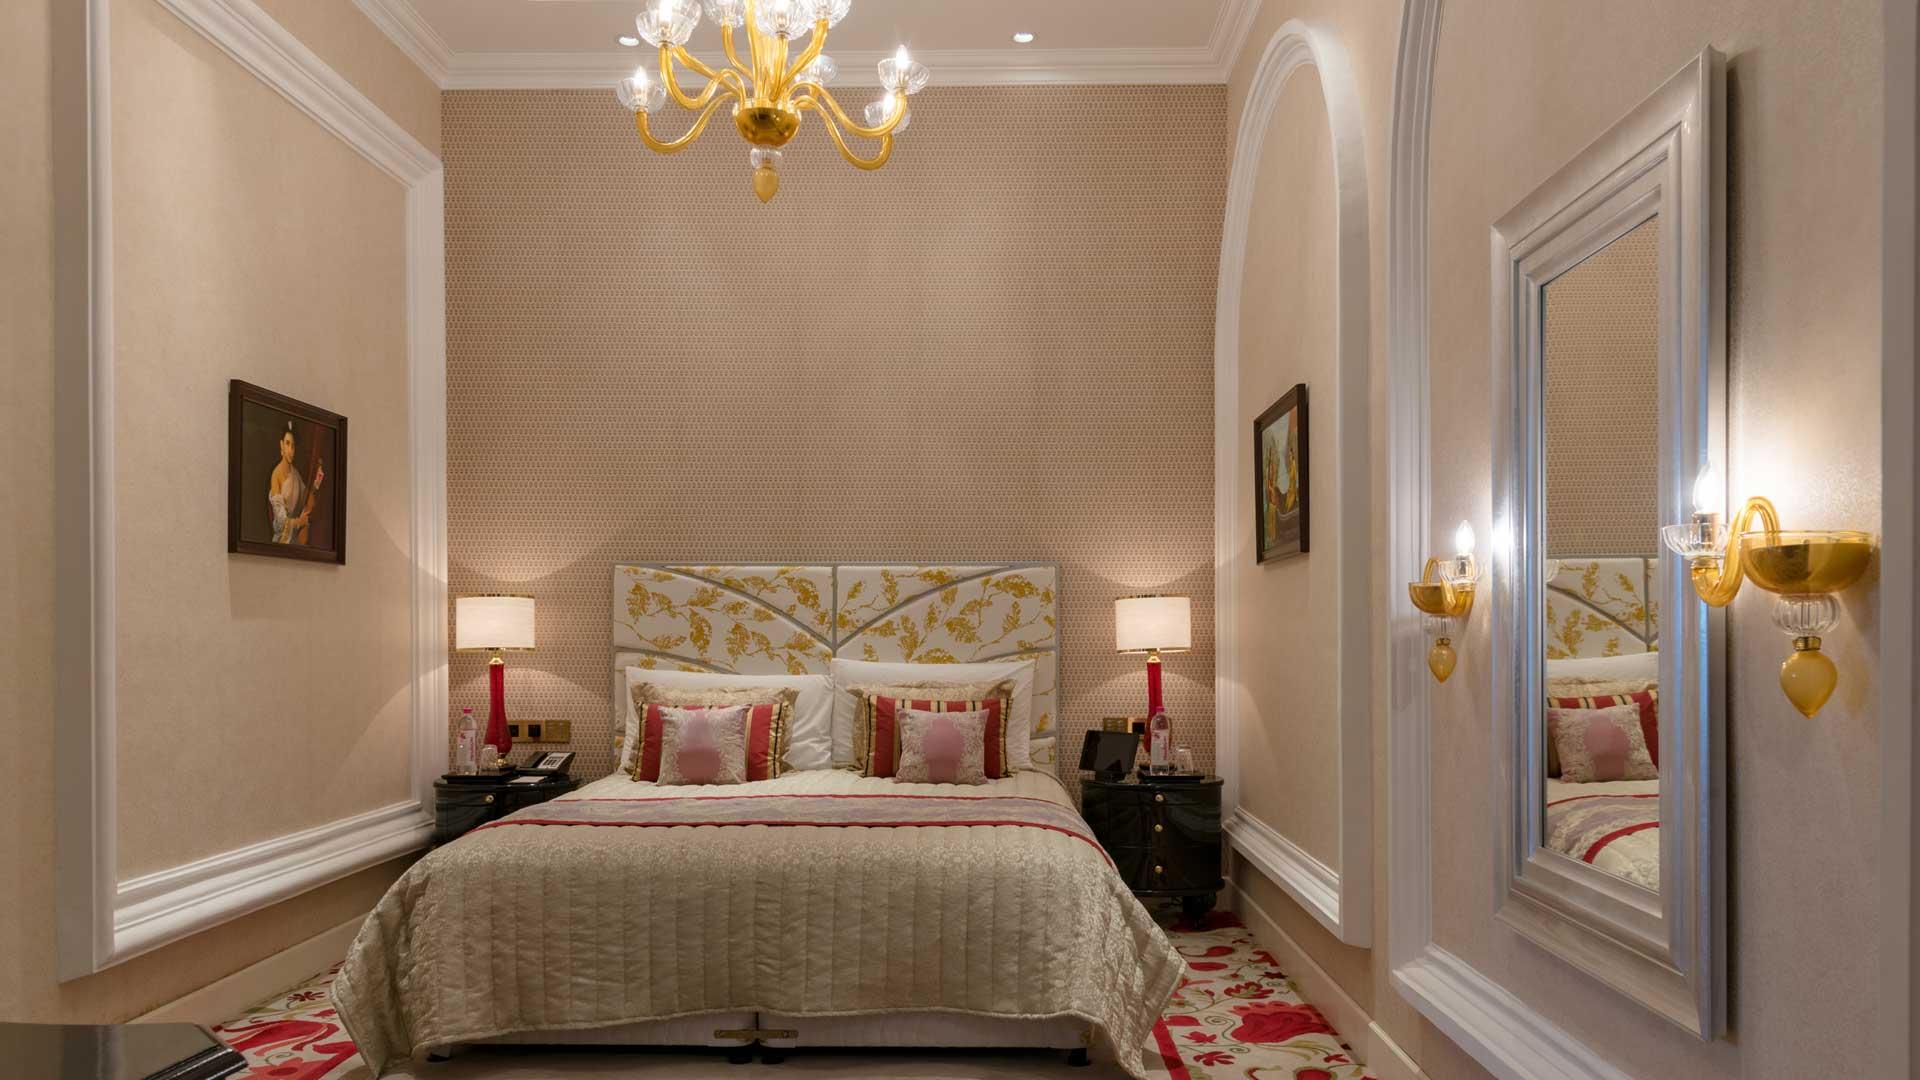 kovalam palace suites Thiruvananthapuram